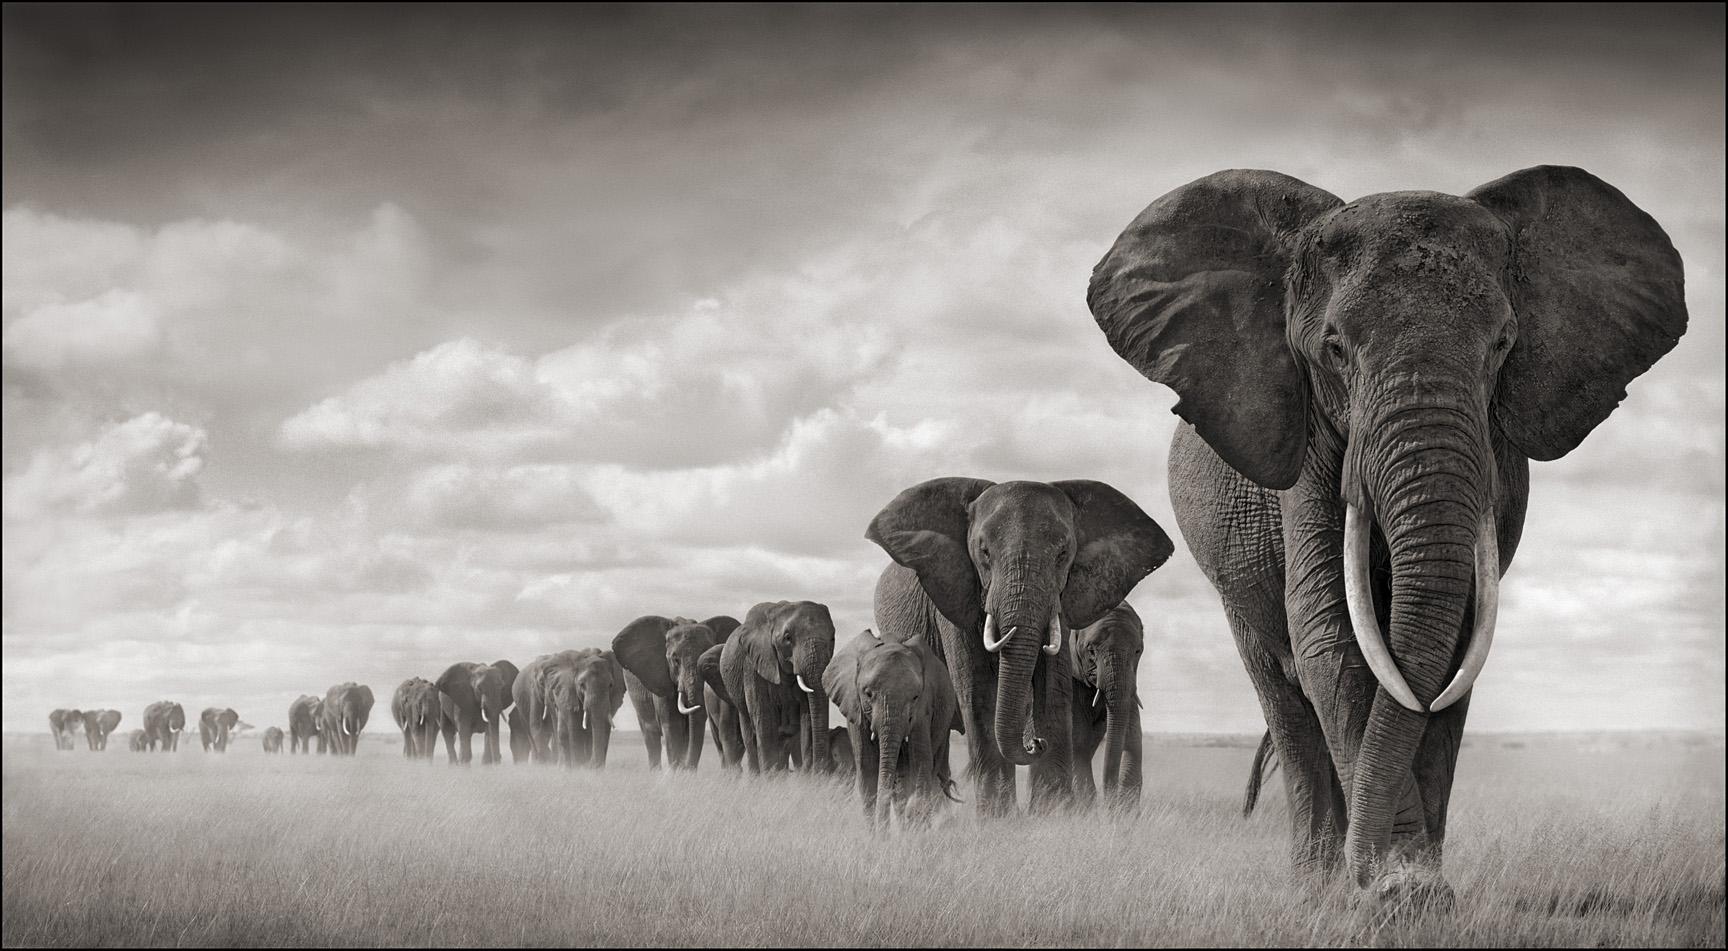 Elephants Walking Through Grass.jpg